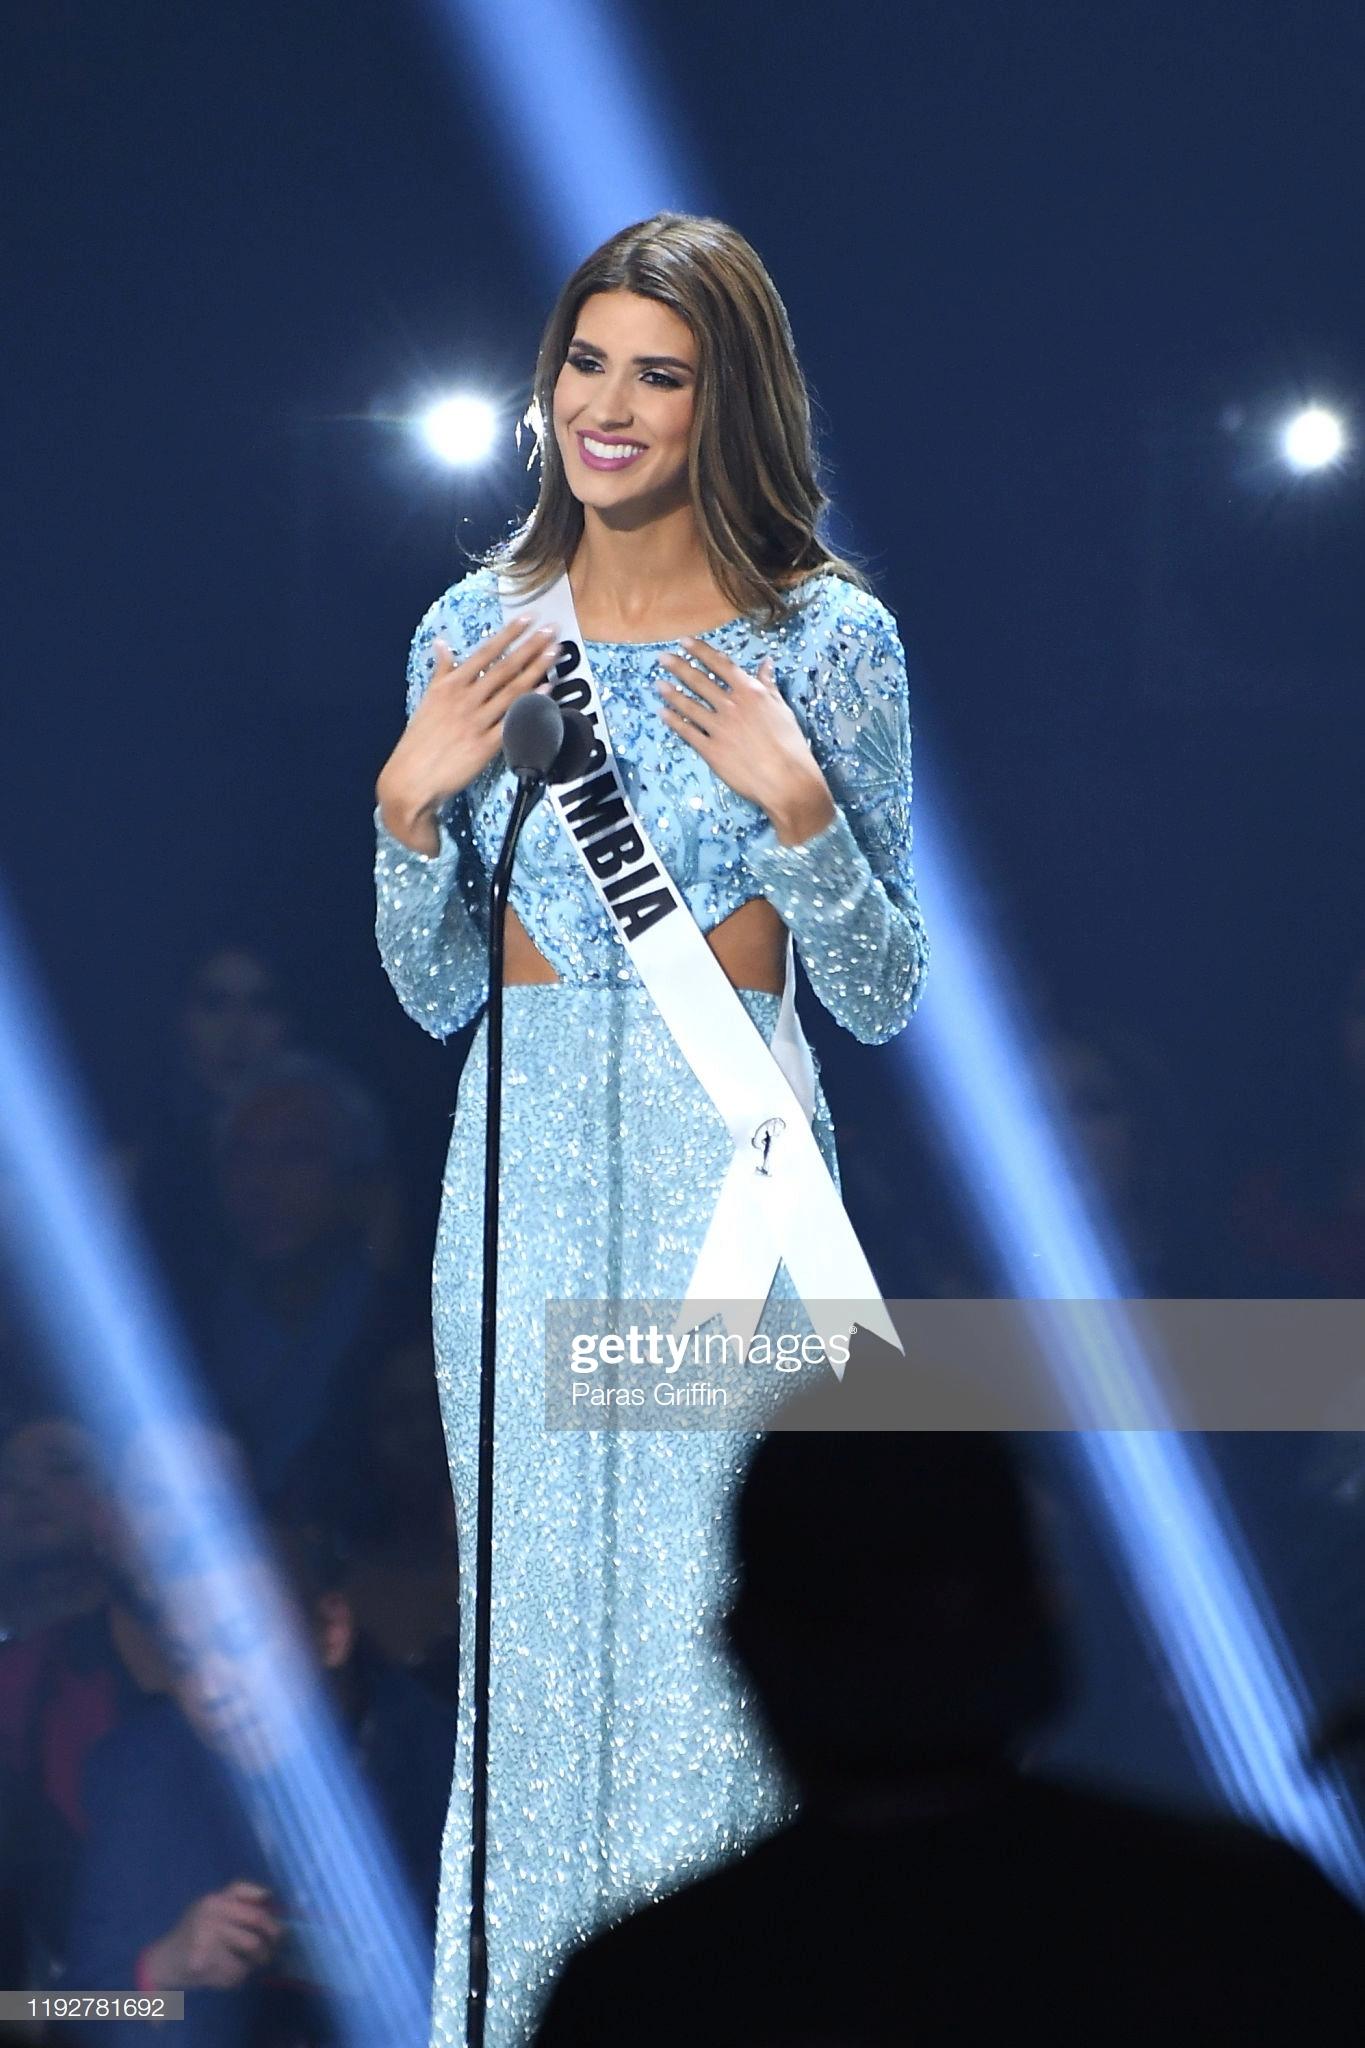 gabriela tafur, top 5 de miss universe 2019. - Página 27 Miss-c12